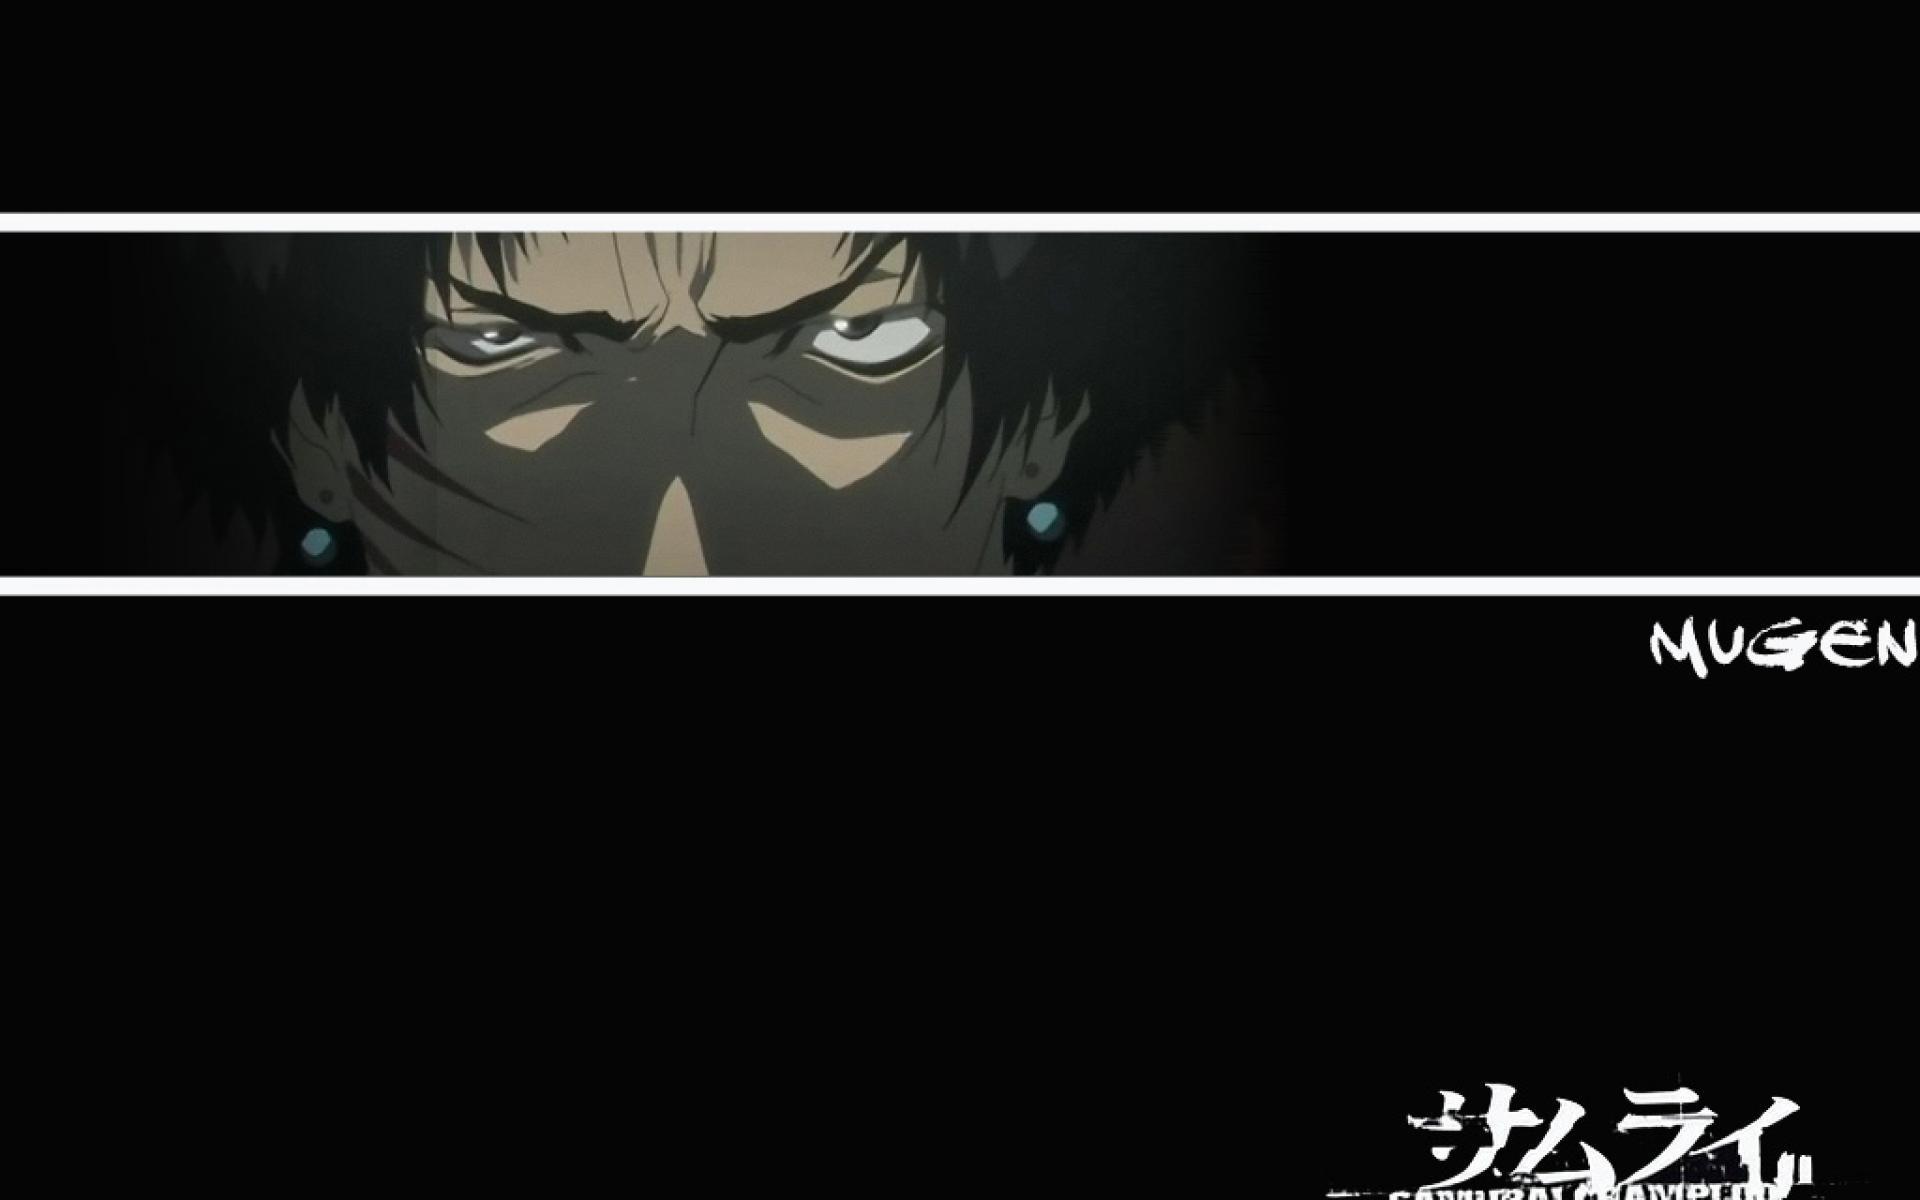 Res: 1920x1200, 2000x1600 Mugen (Samurai Champloo) download Mugen (Samurai Champloo) image